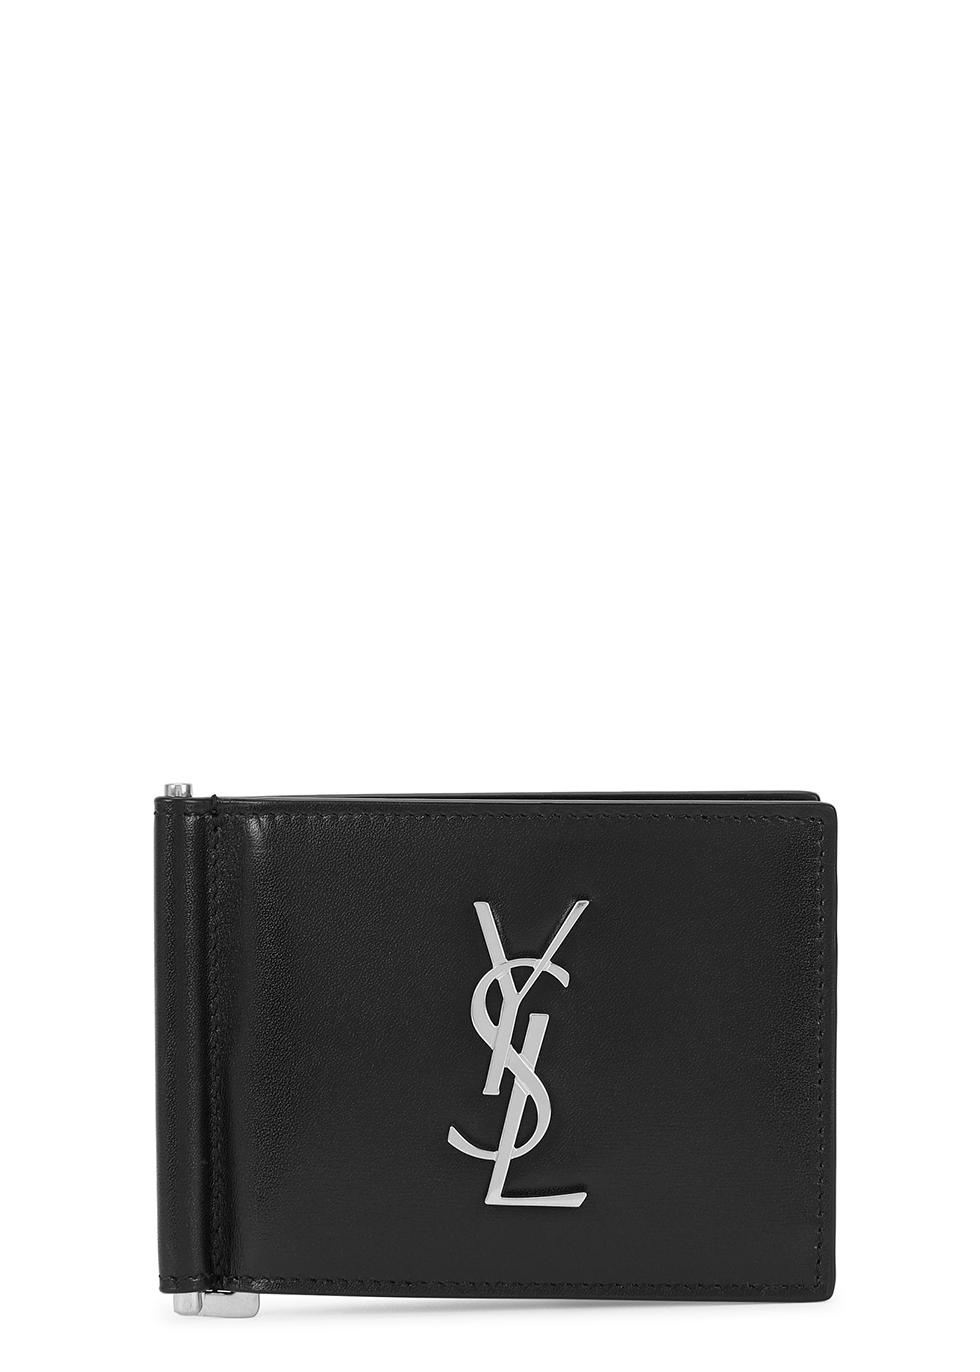 Ford Leather Money Clip//Cardholder